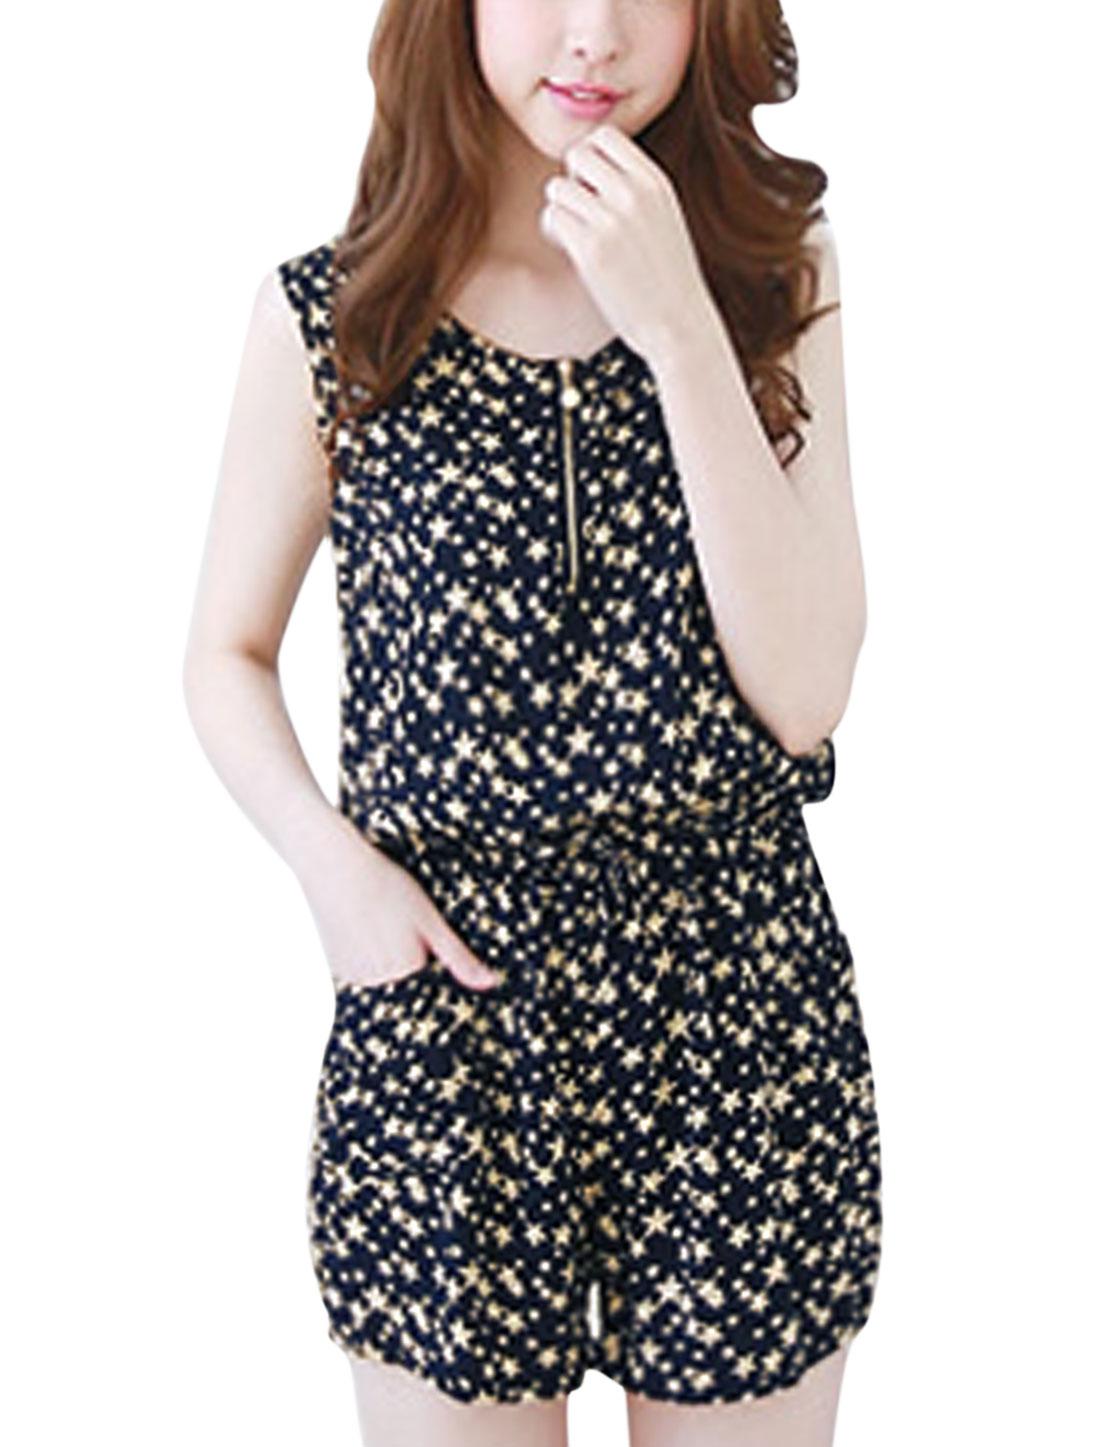 Women Stars Pattern Zip Closure Upper Sleeveless Casual Romper Black Beige XS